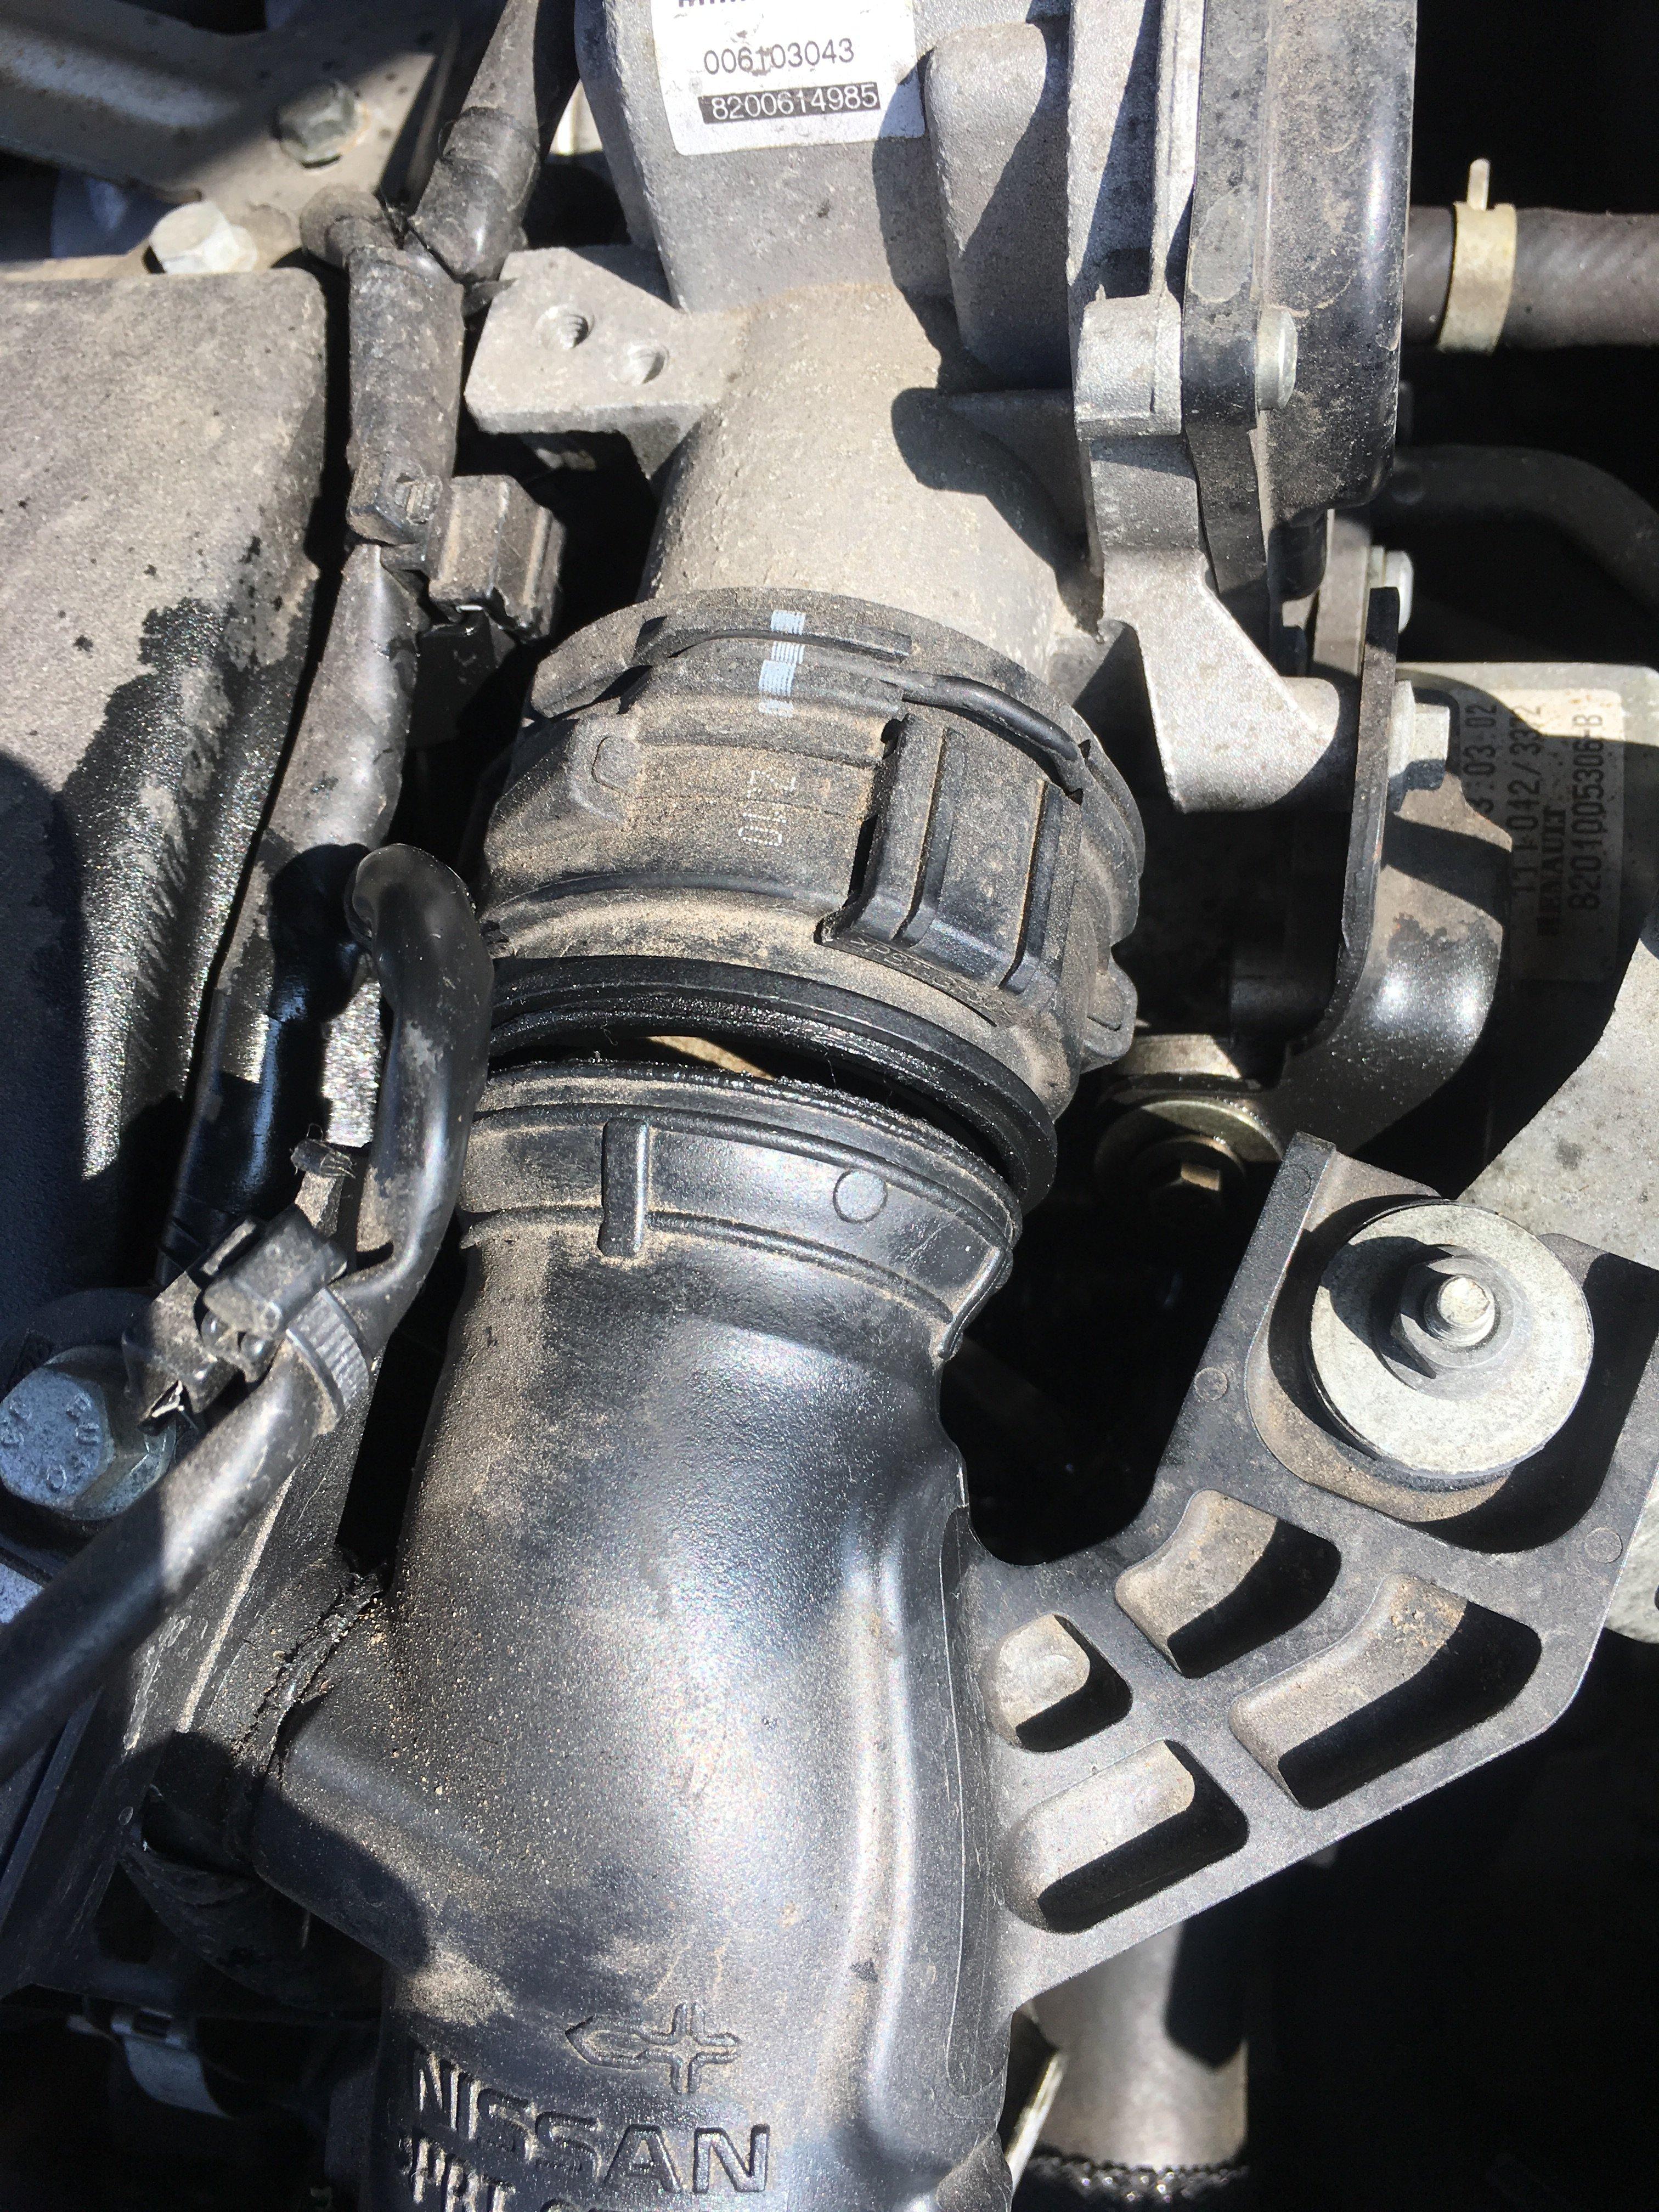 Resetting Engine Warning Light (Nissan Qashqai) | AVForums